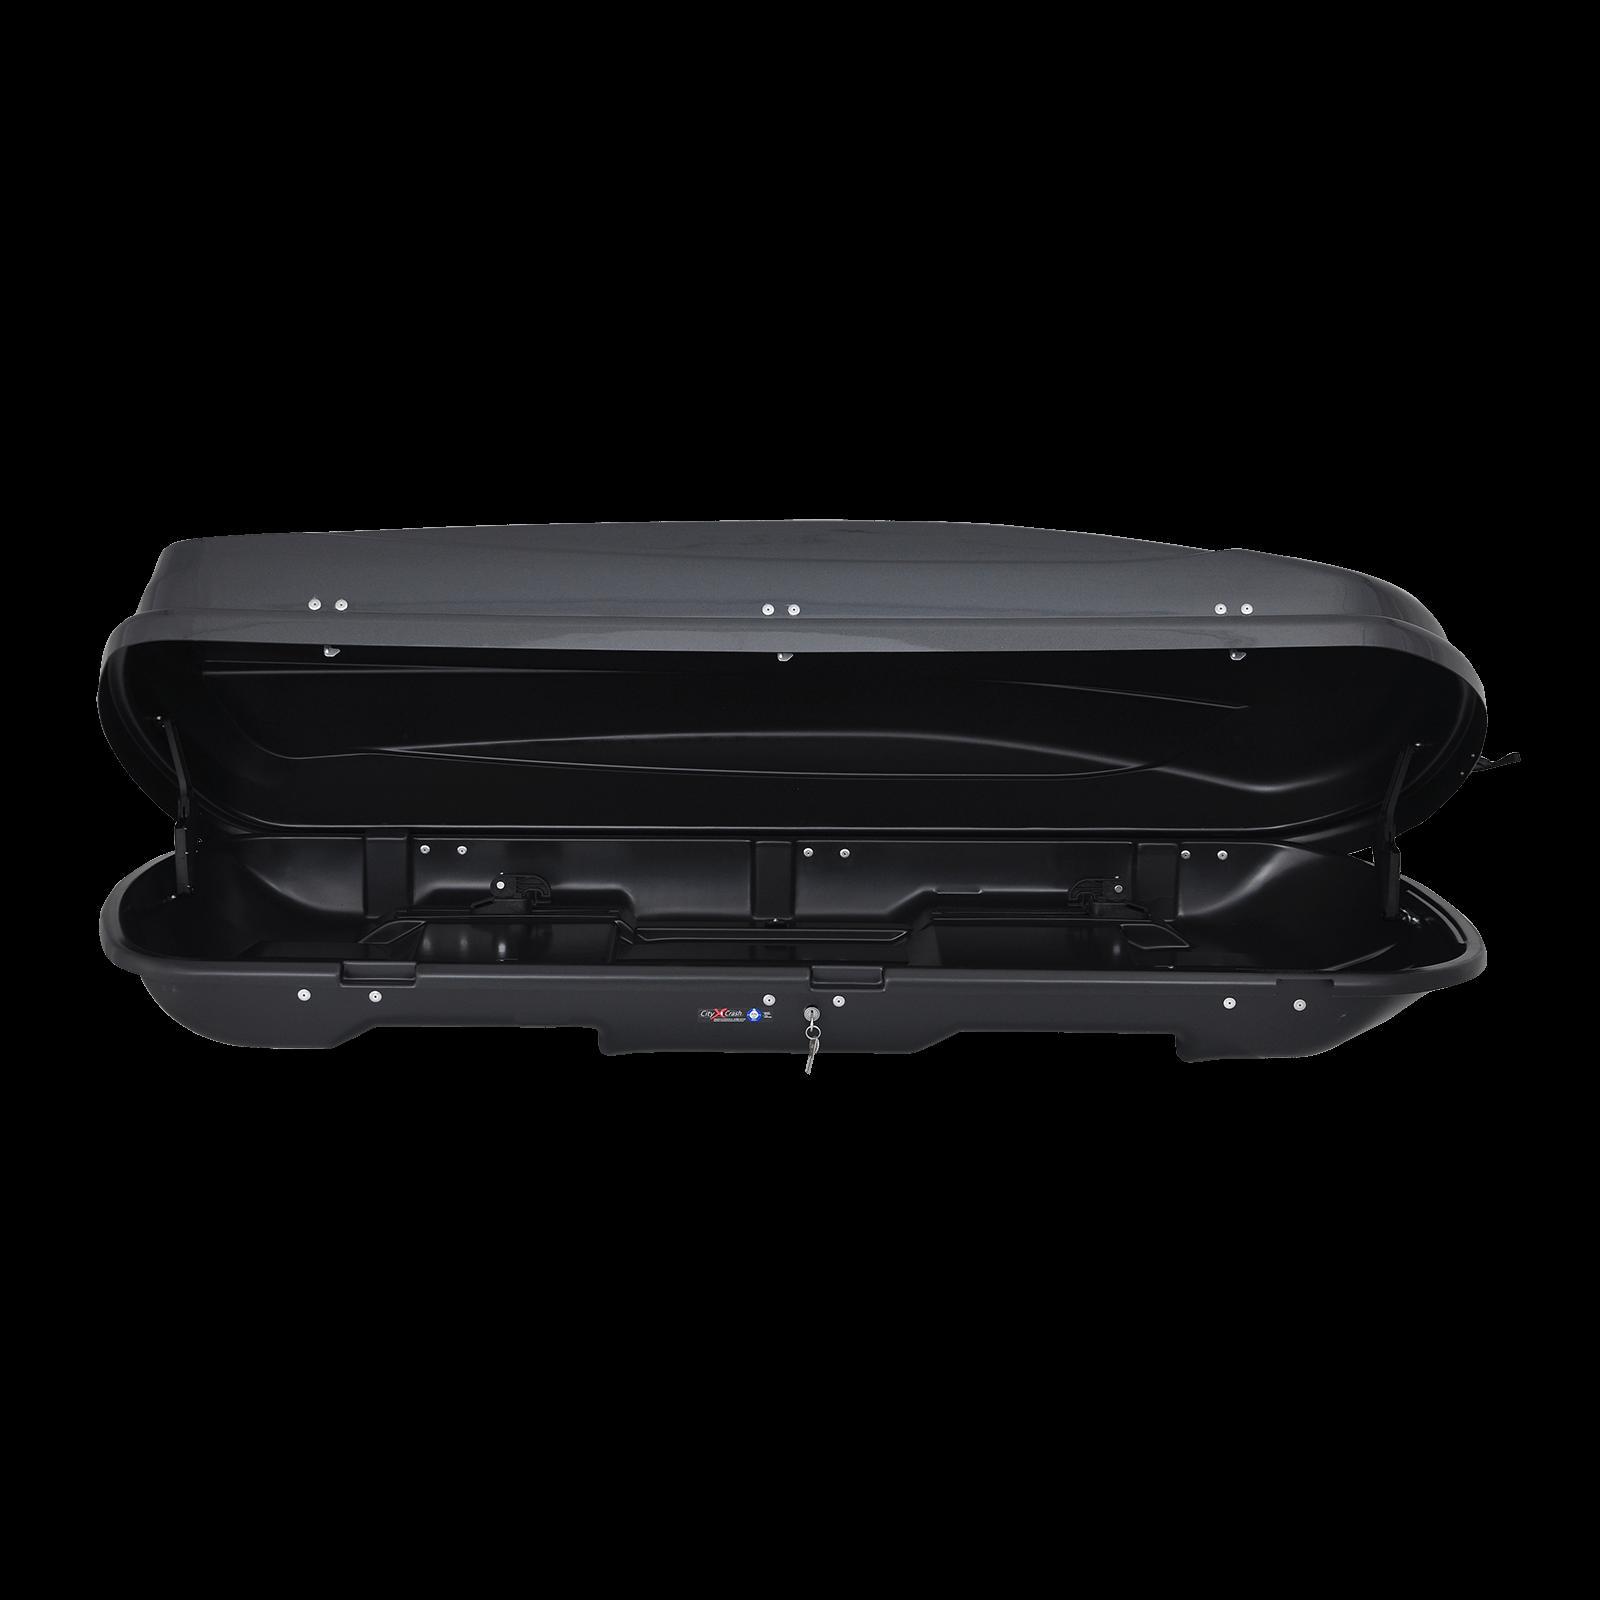 Dachbox Junior Xtreme 500 grau glänzend - Bild 2